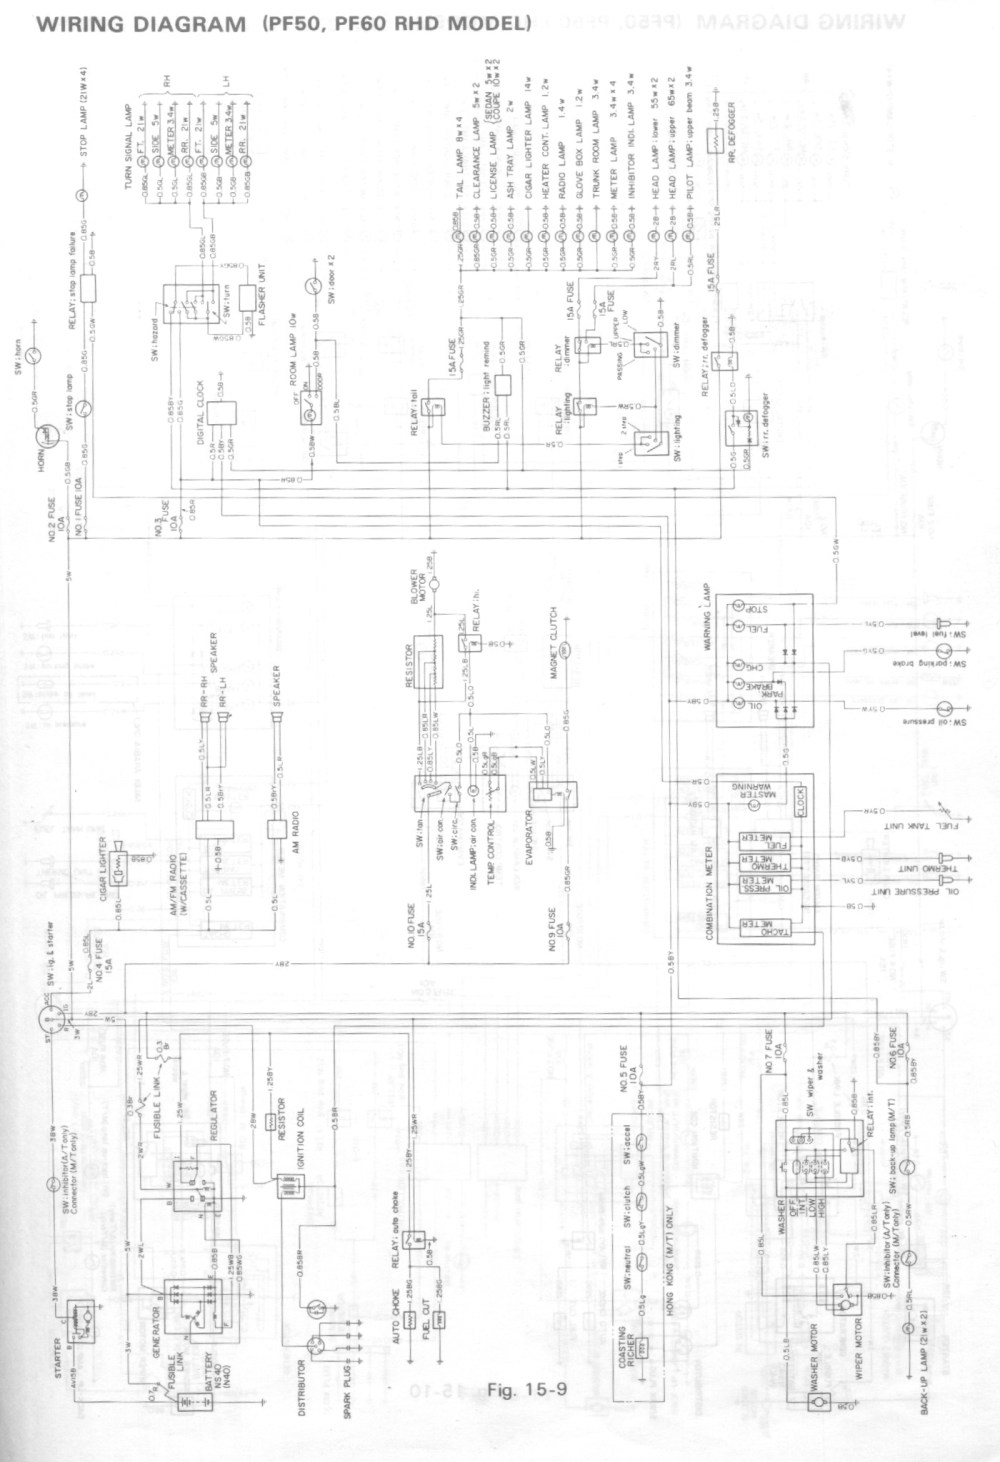 medium resolution of isuzu gemini wiring diagram wiring diagram schematics rh ksefanzone com isuzu rodeo radio wiring diagram isuzu